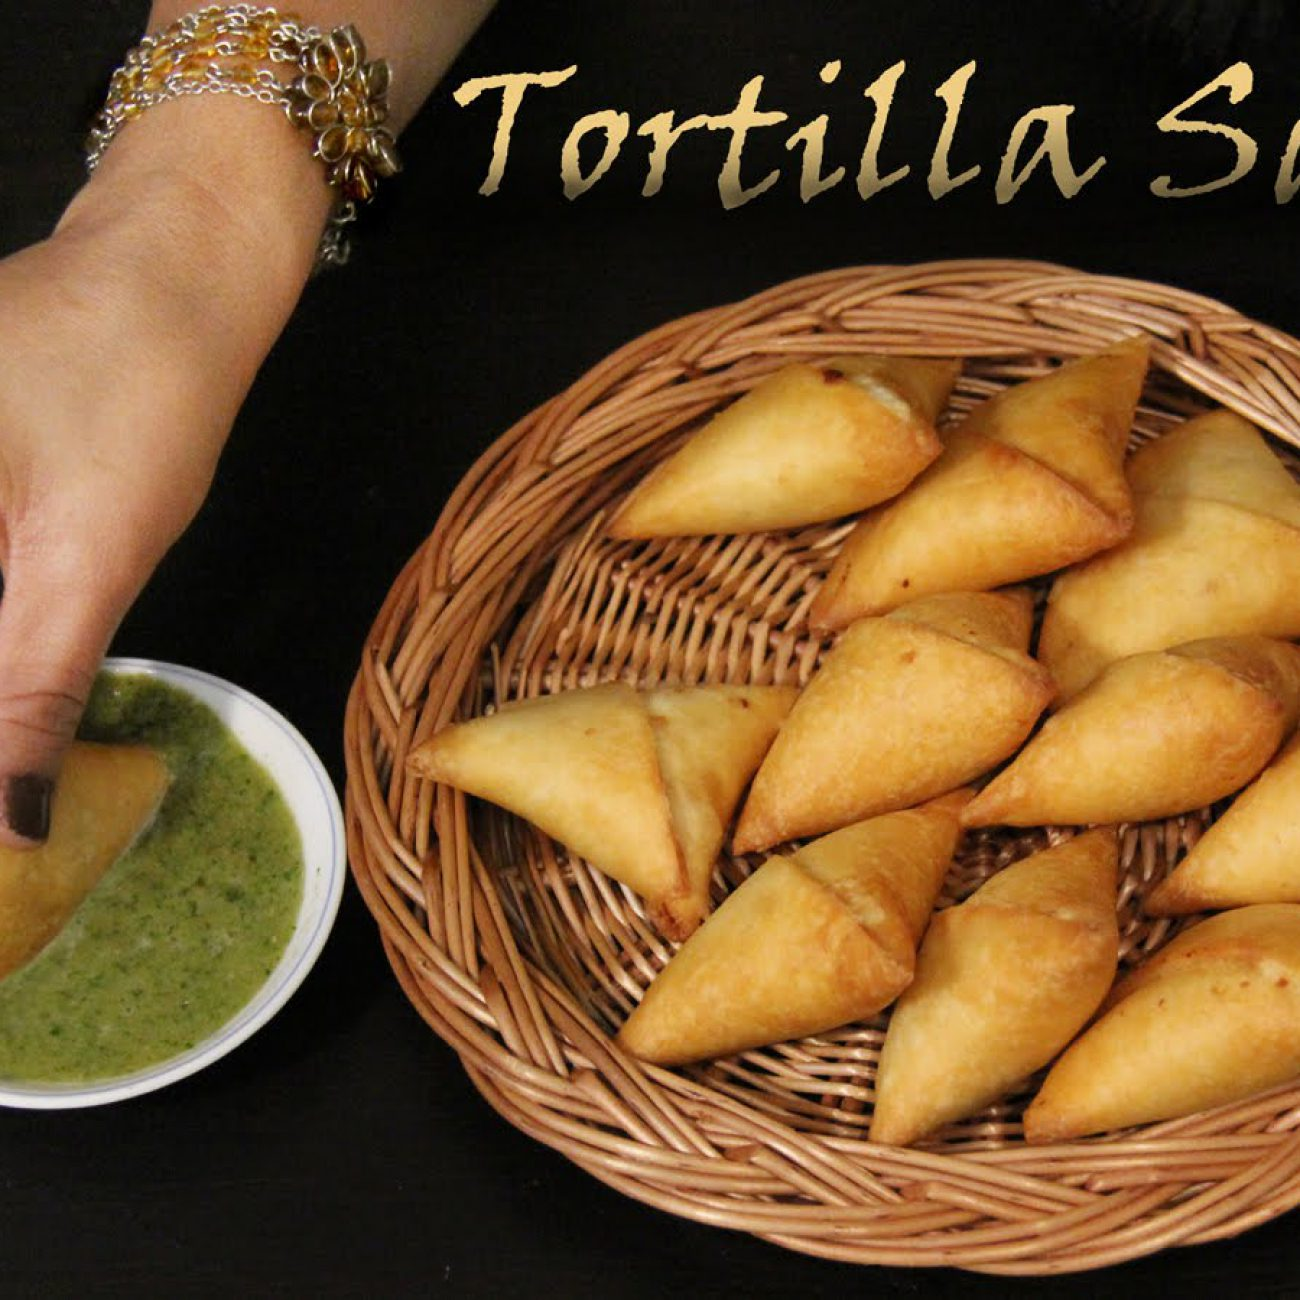 Tortilla Samosa Recipe   No Dough Samosa Recipe   Veg Snacks Starter & Appetizers for Parties Shilpi